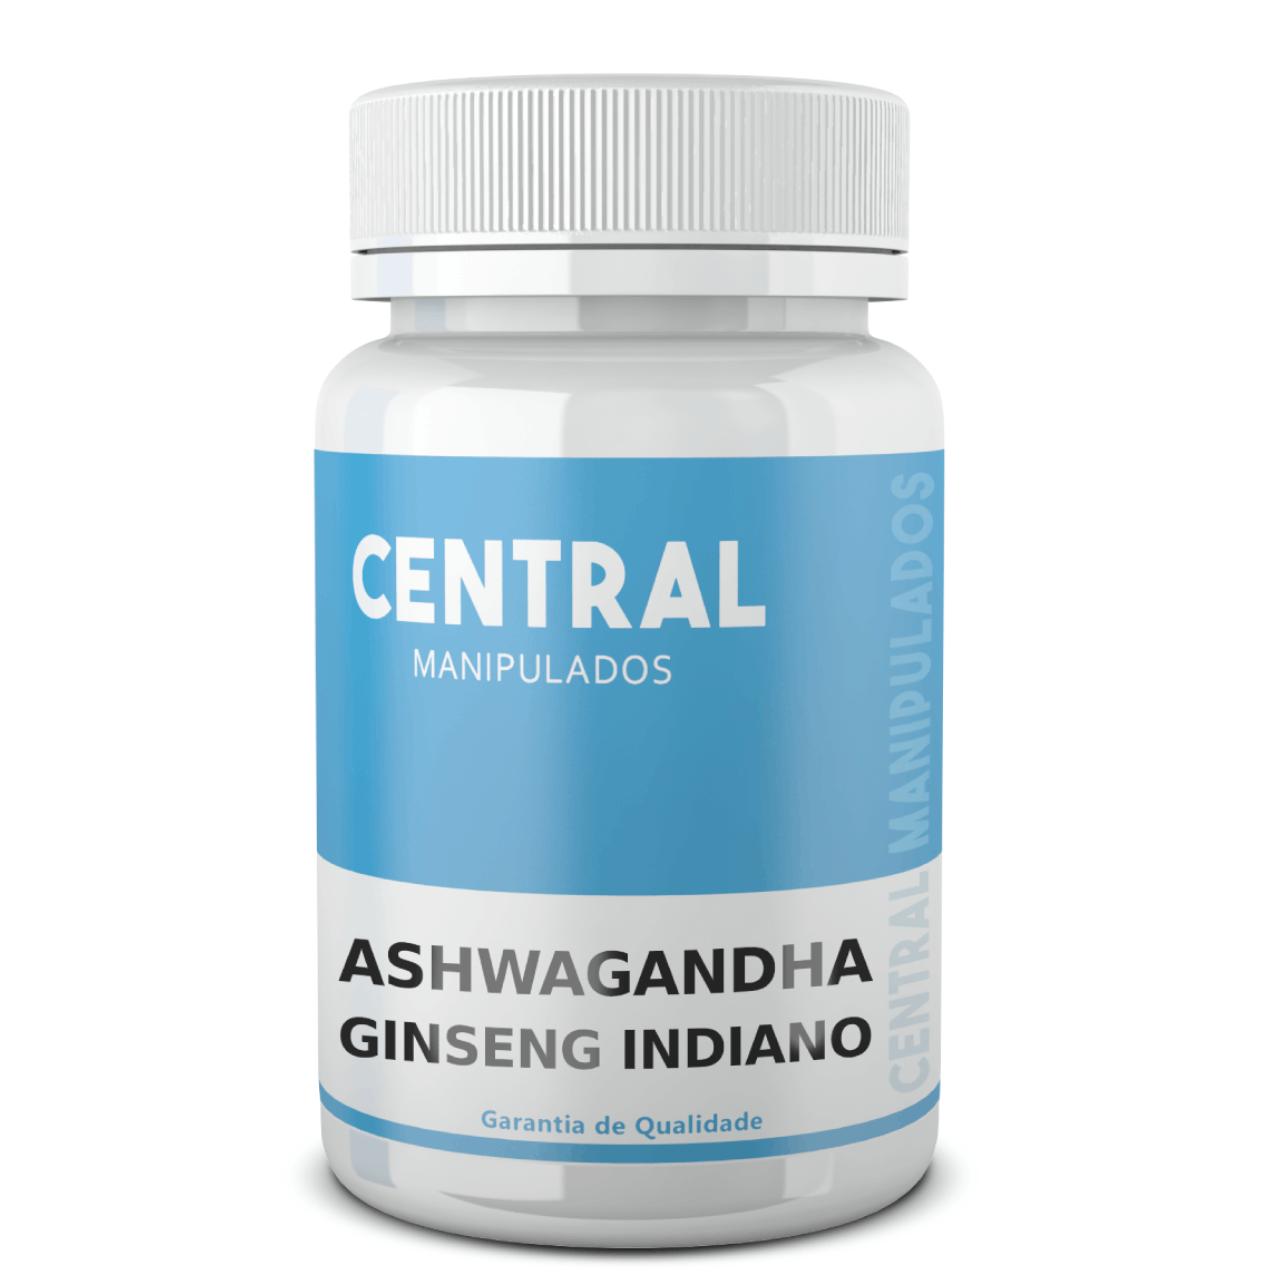 Ginseng Indiano - Ashwagandha - 500mg - 120 cápsulas